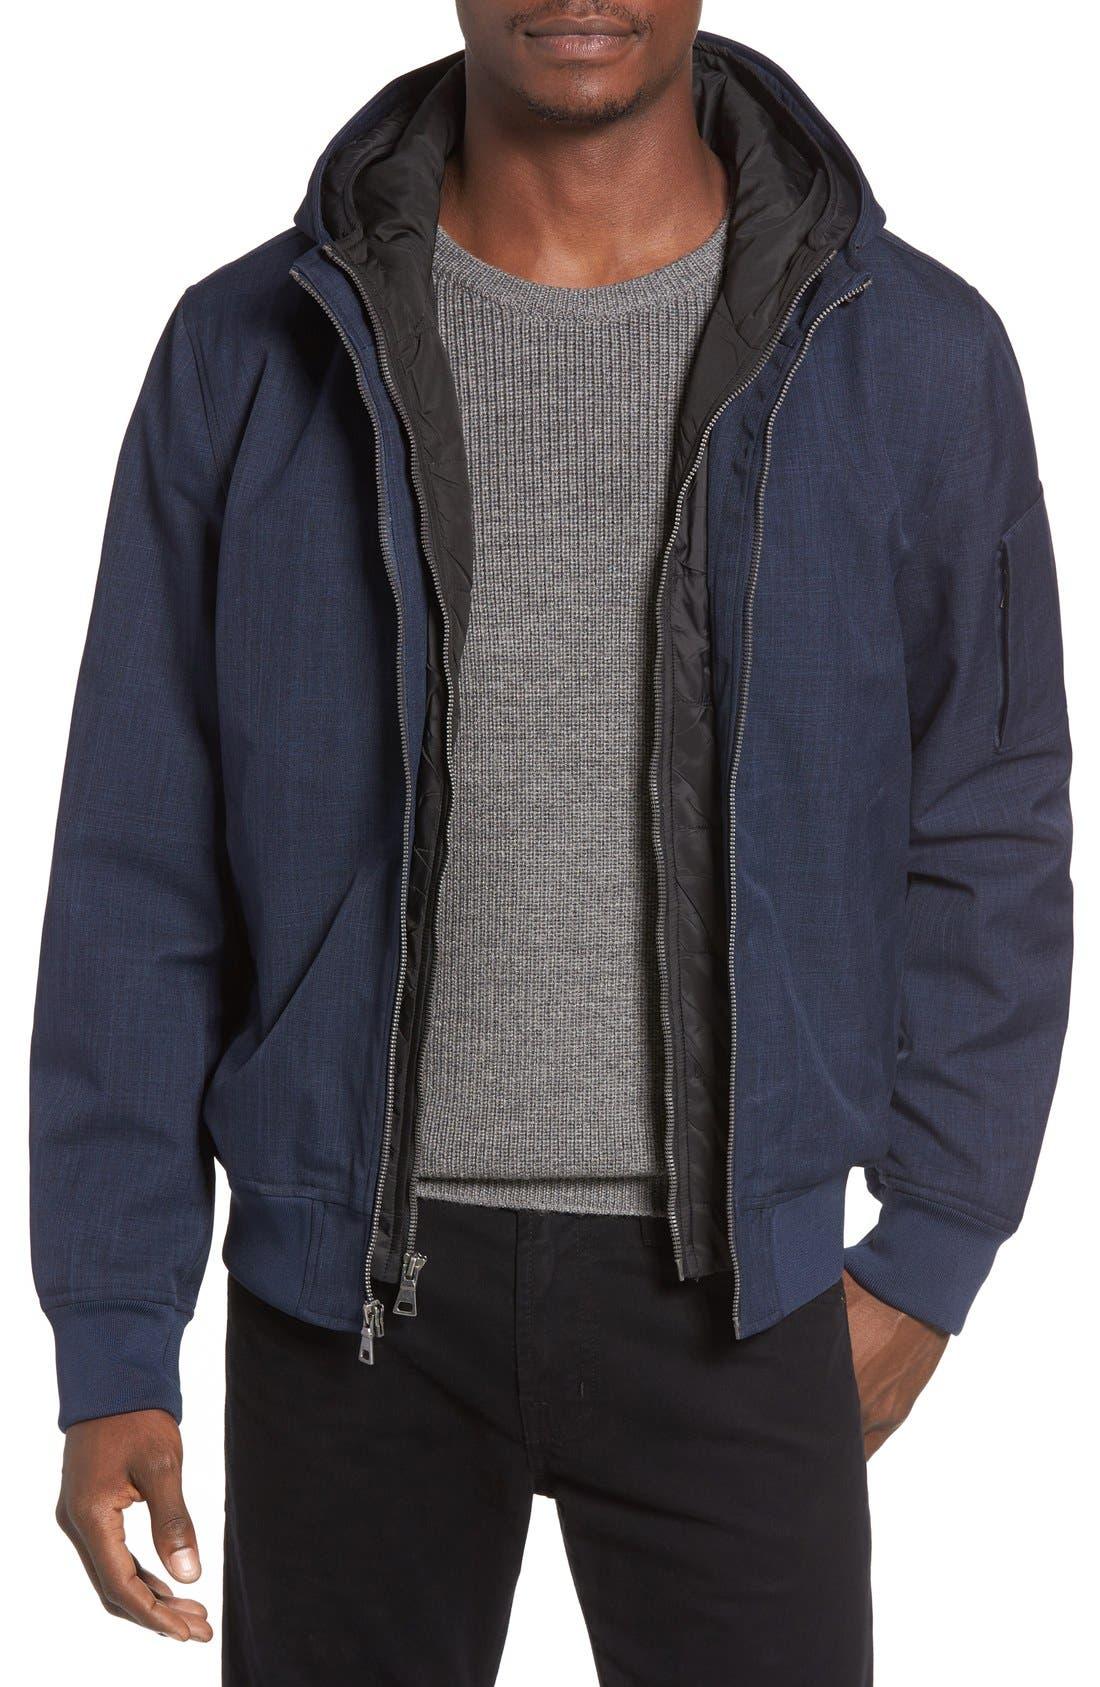 Black Rivet Hooded Jacket